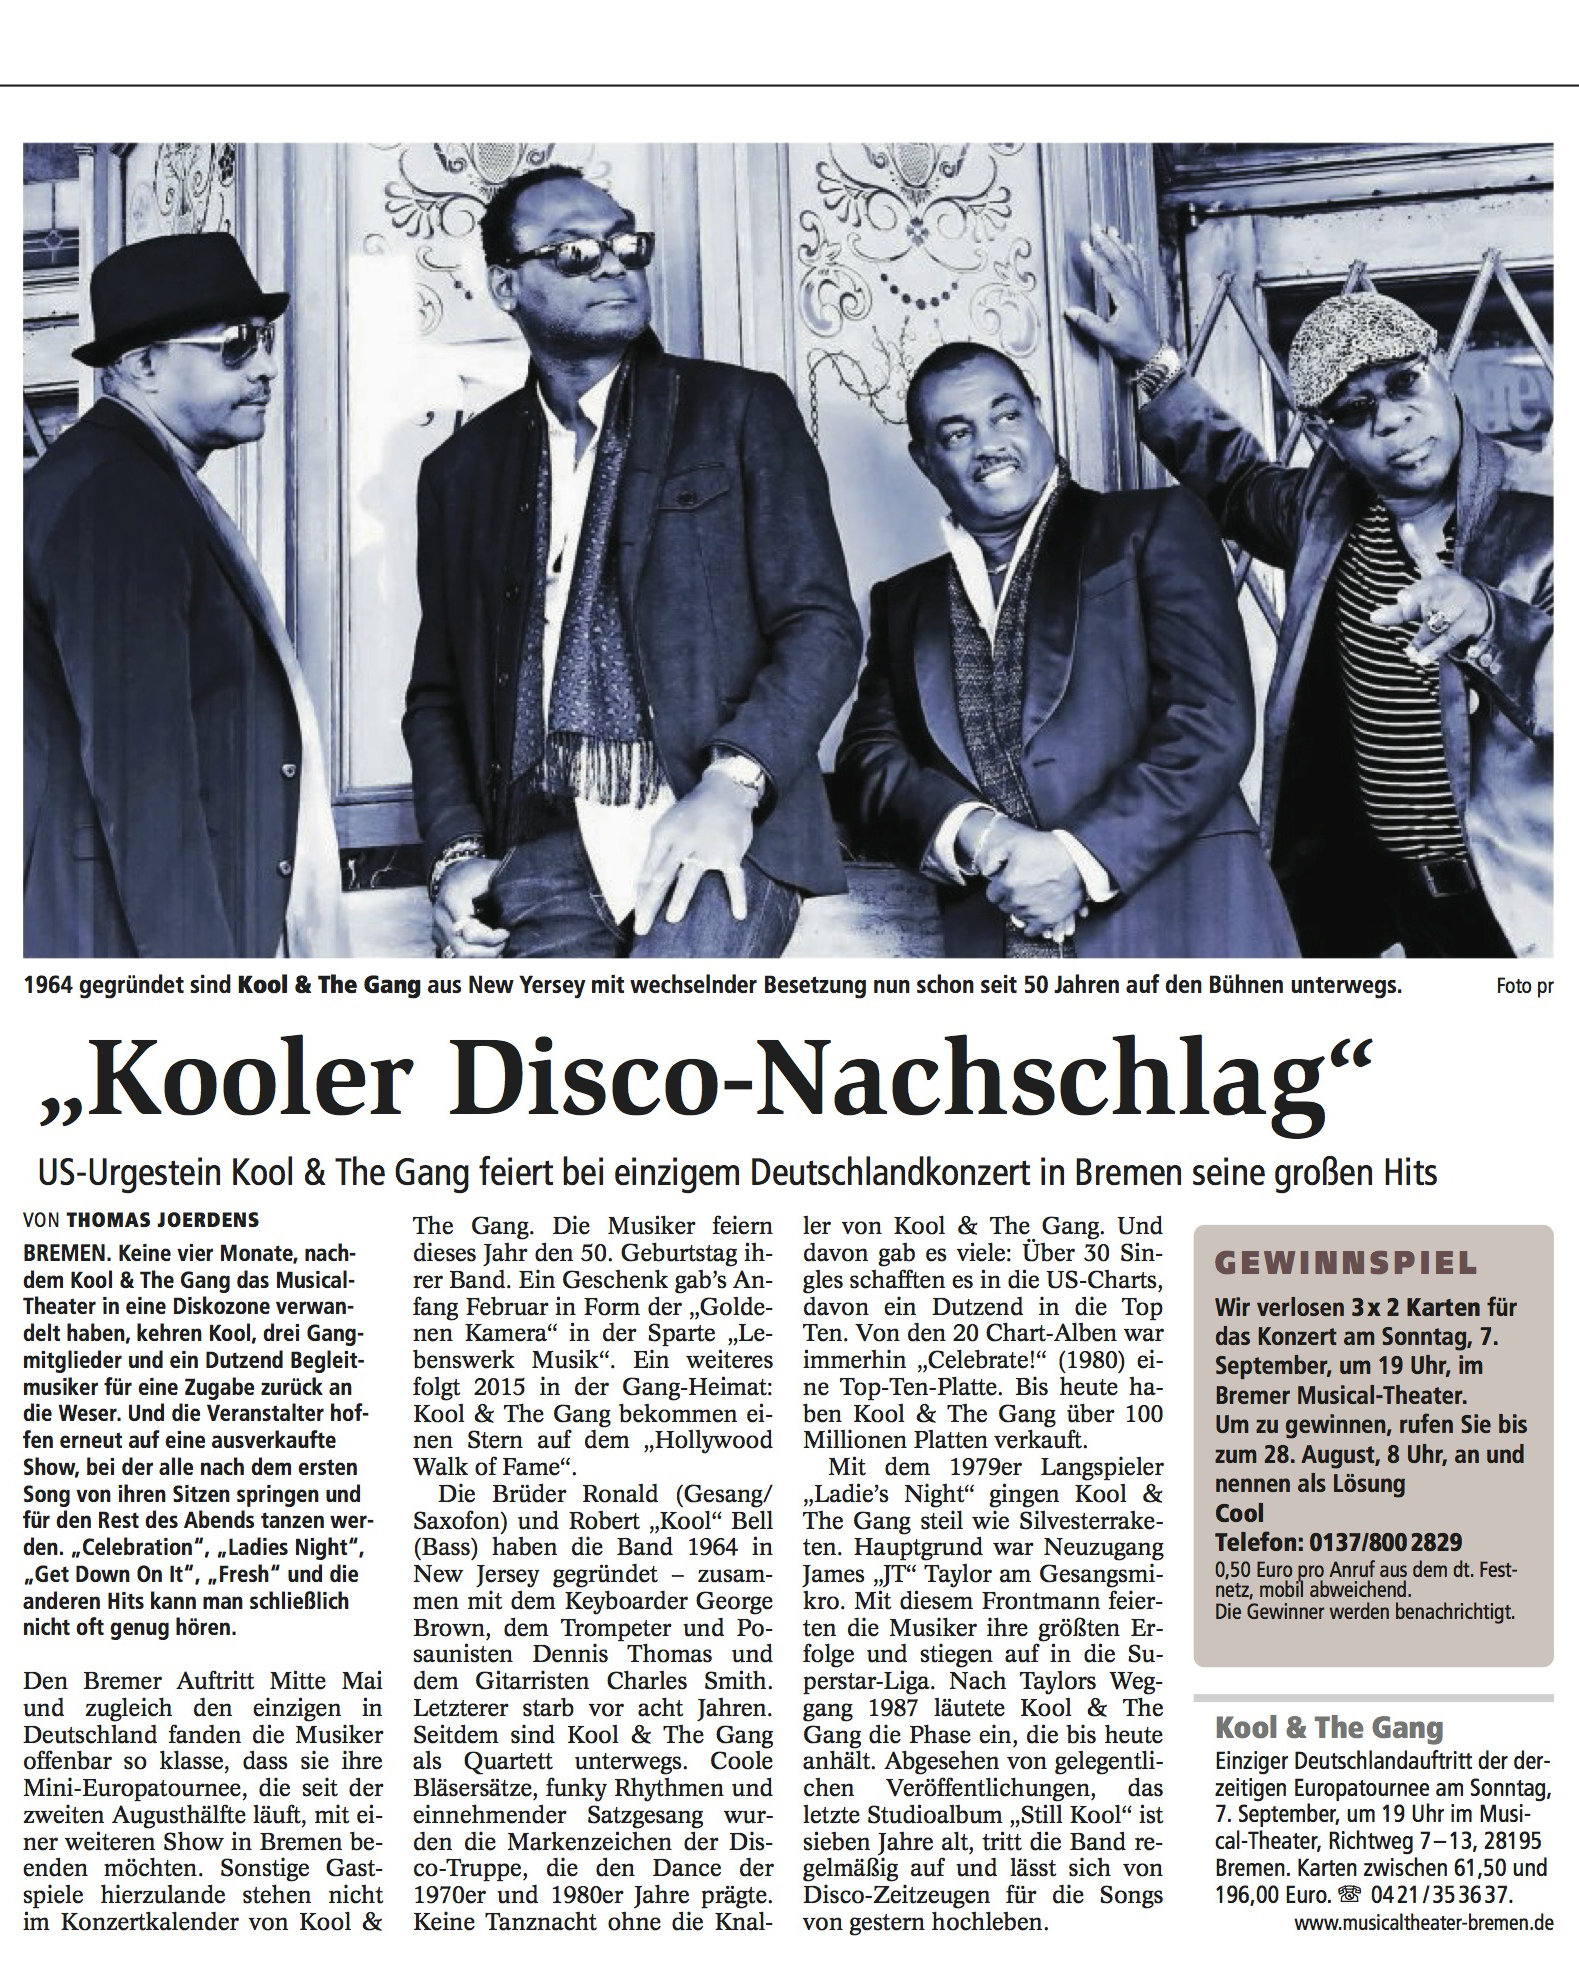 kool and the gang, bremen 23.8.14.jpg